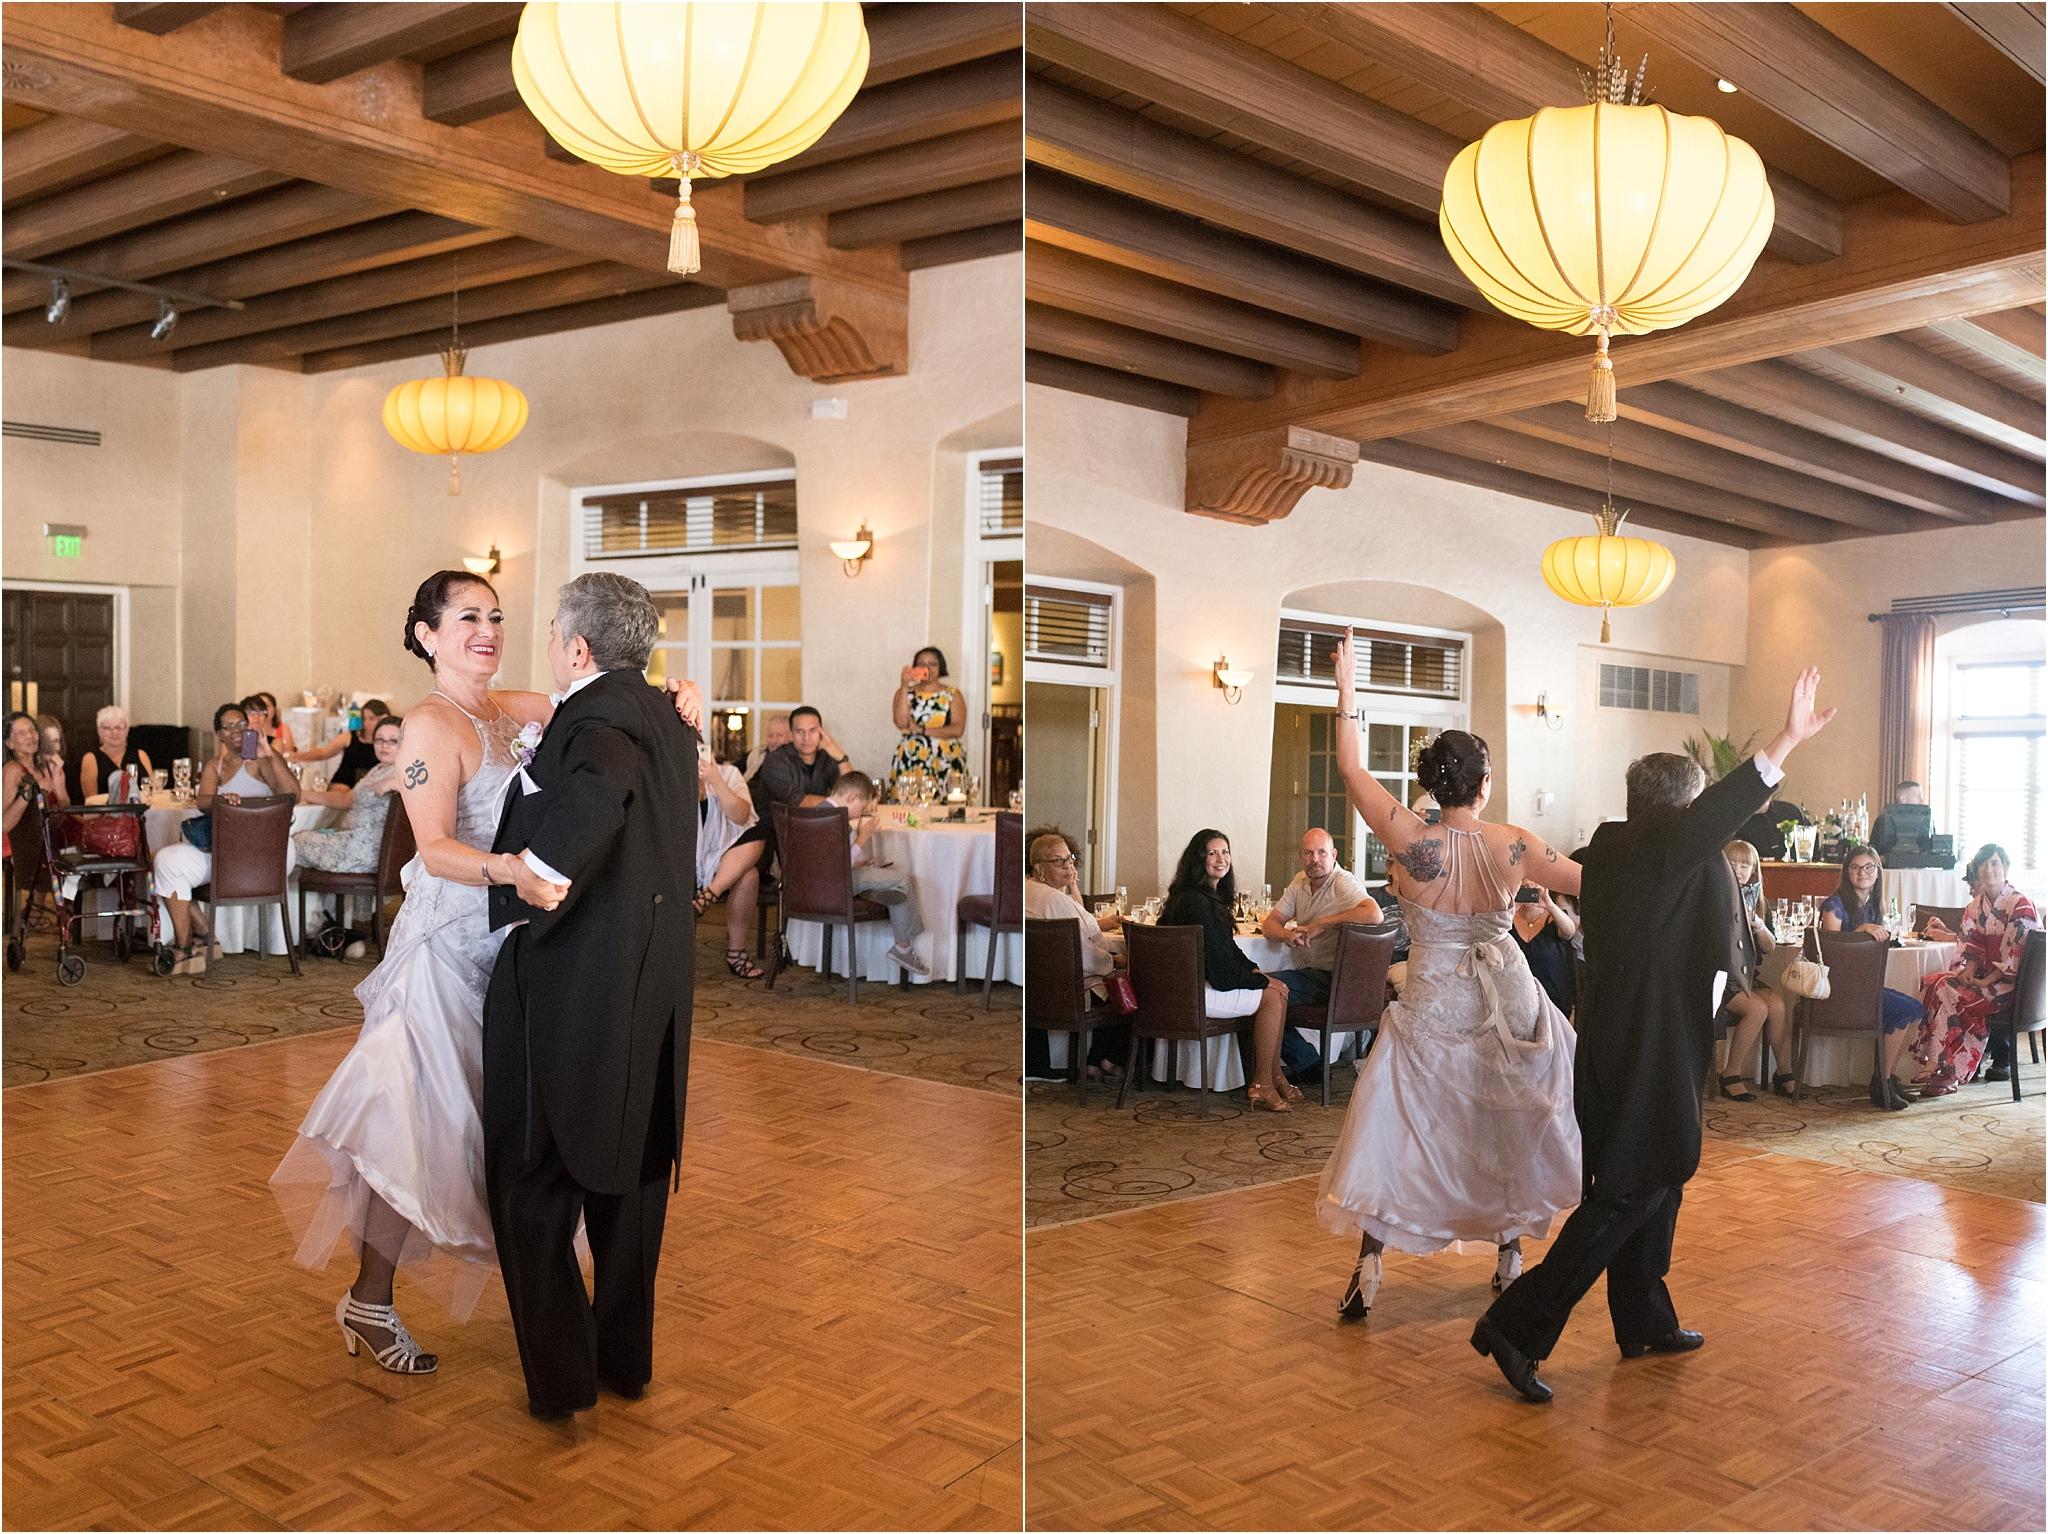 kayla kitts photography - albuquerque wedding photographer - hotel andaluz wedding_0026.jpg